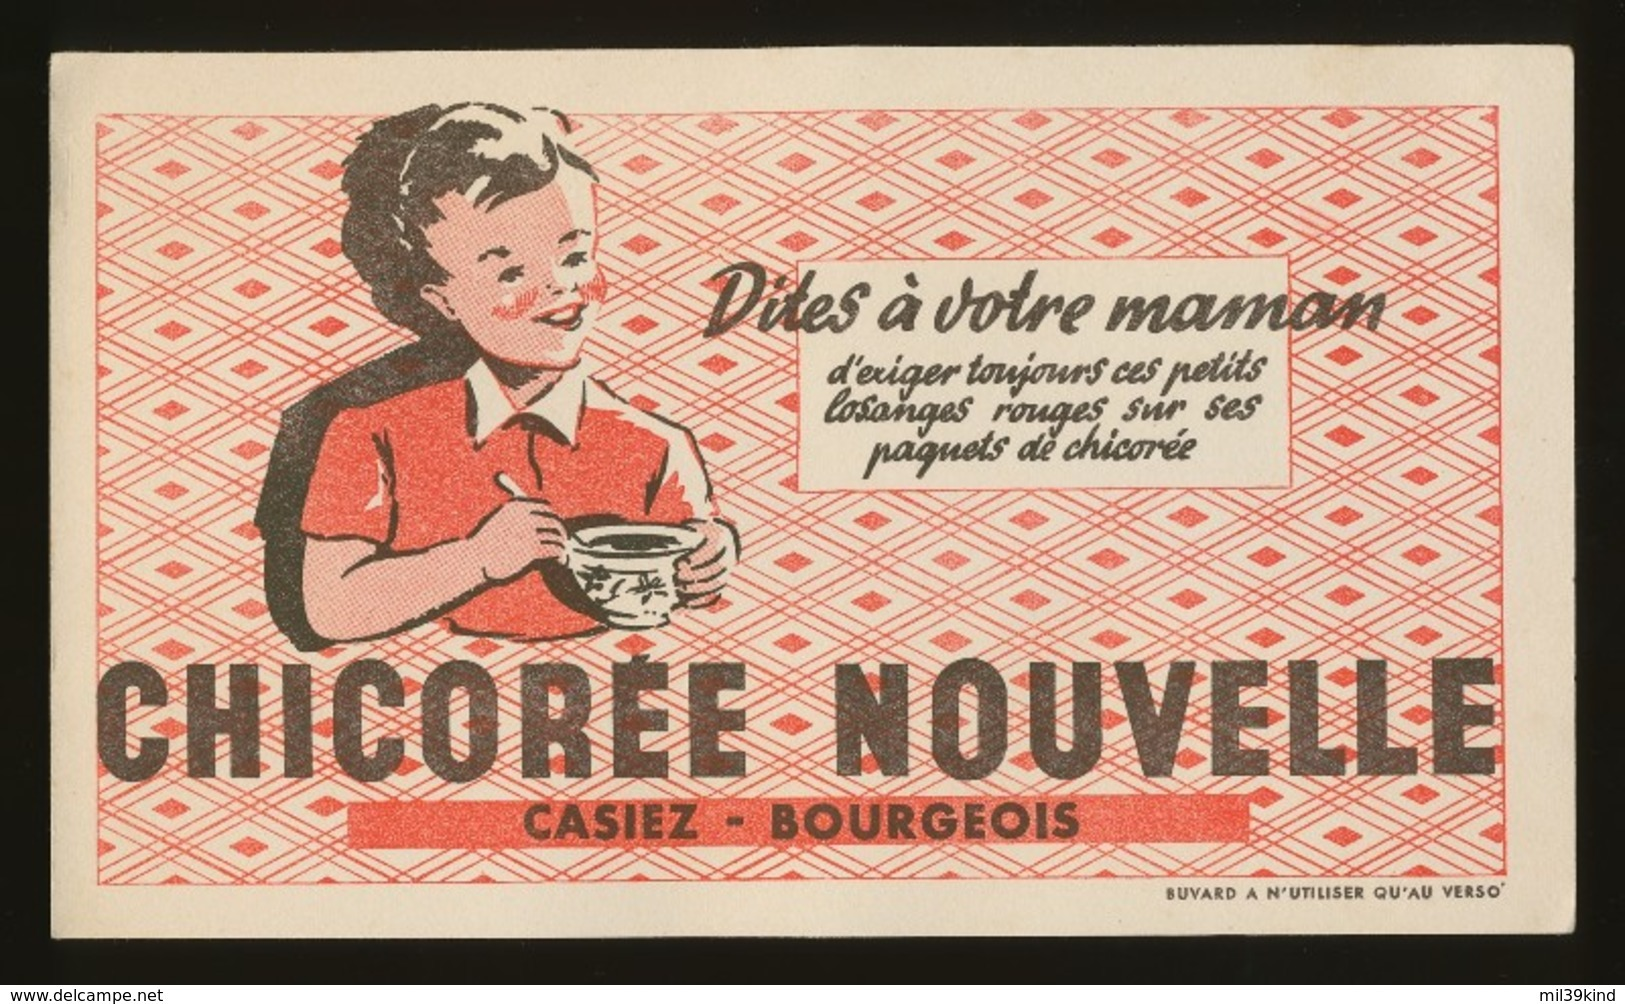 Buvard - CHICOREE NOUVELLE - Casier - Bourgeois - C